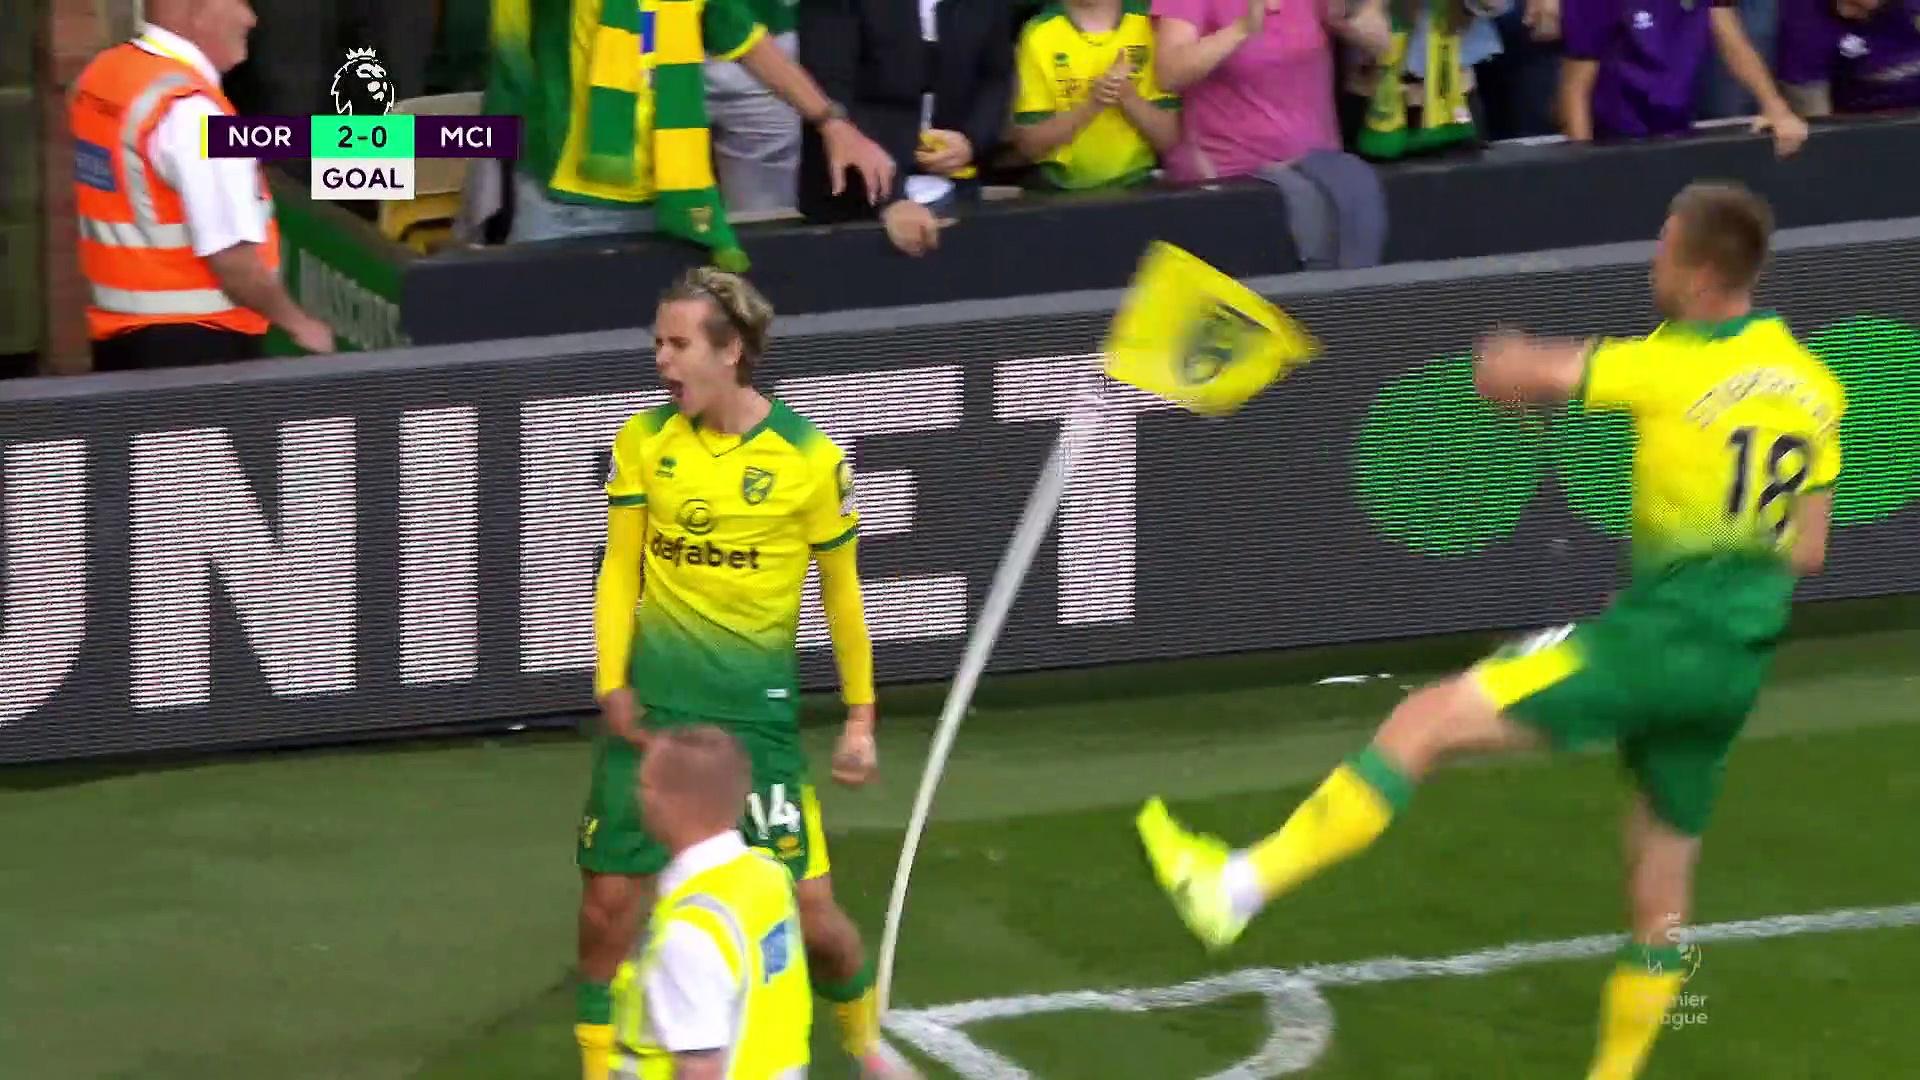 5.hafta / Norwich - Manchester City: 3-2 (Özet)